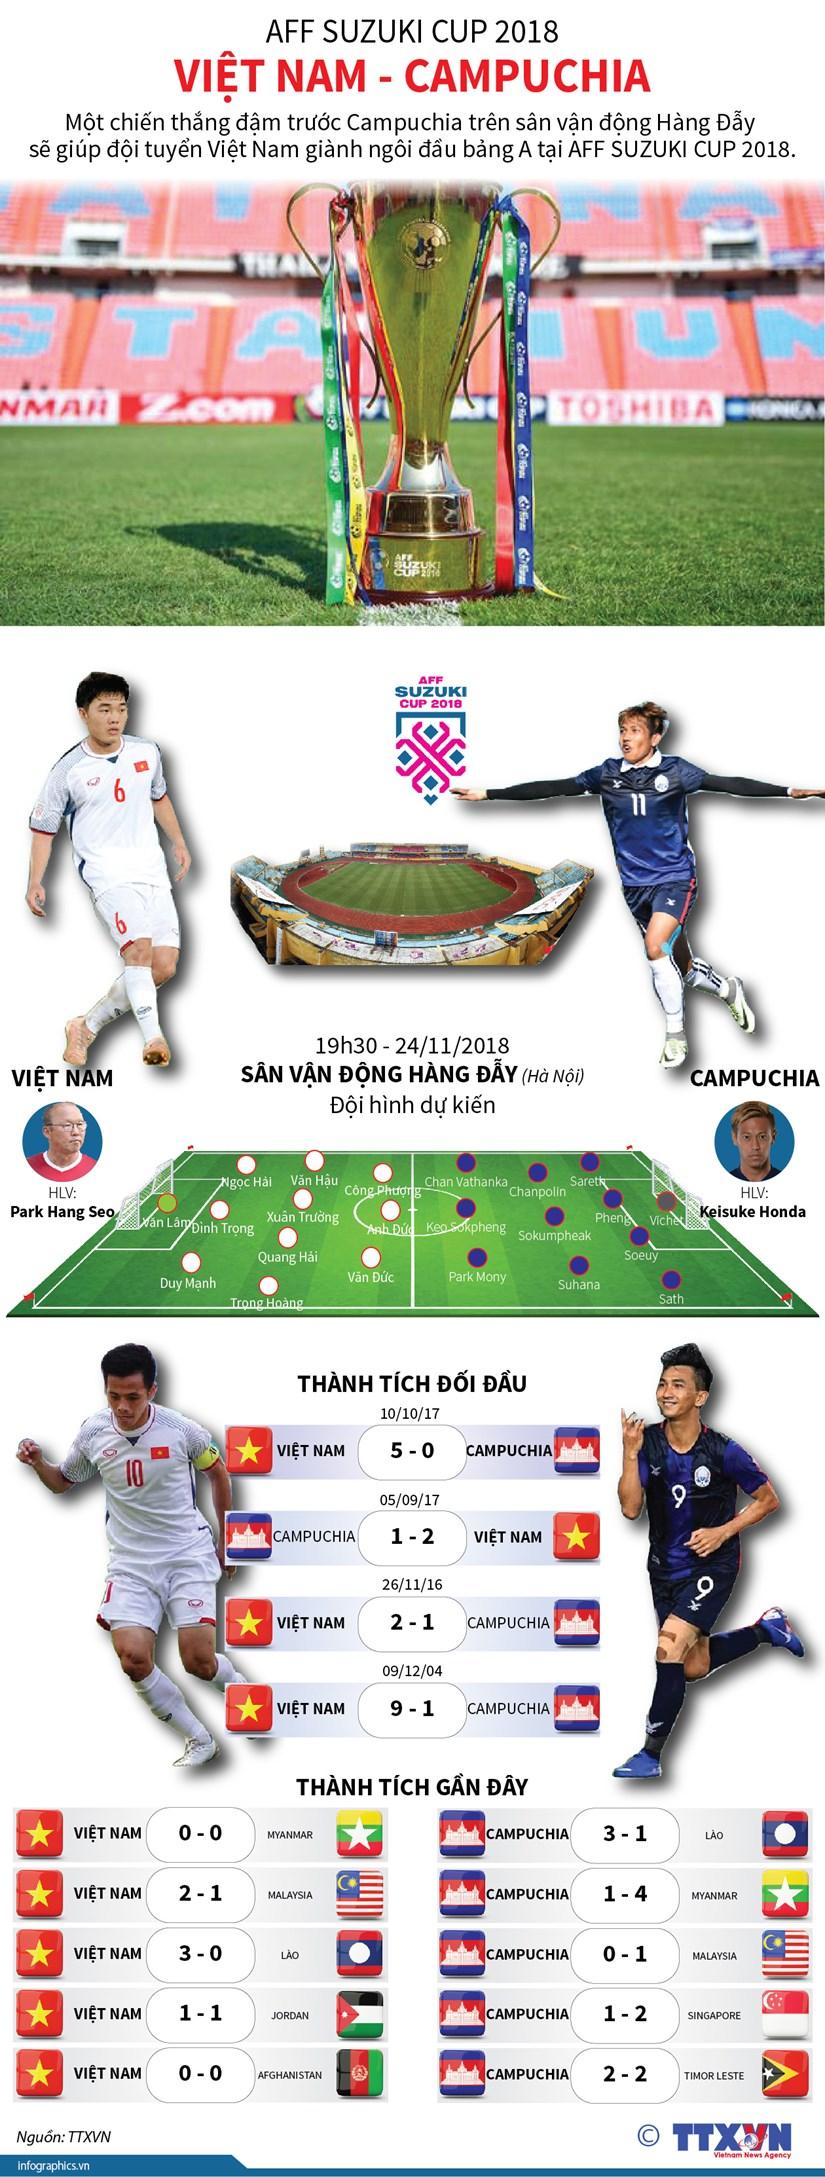 [Infographics] Toan canh truoc tran quyet dau Viet Nam vs Campuchia hinh anh 1